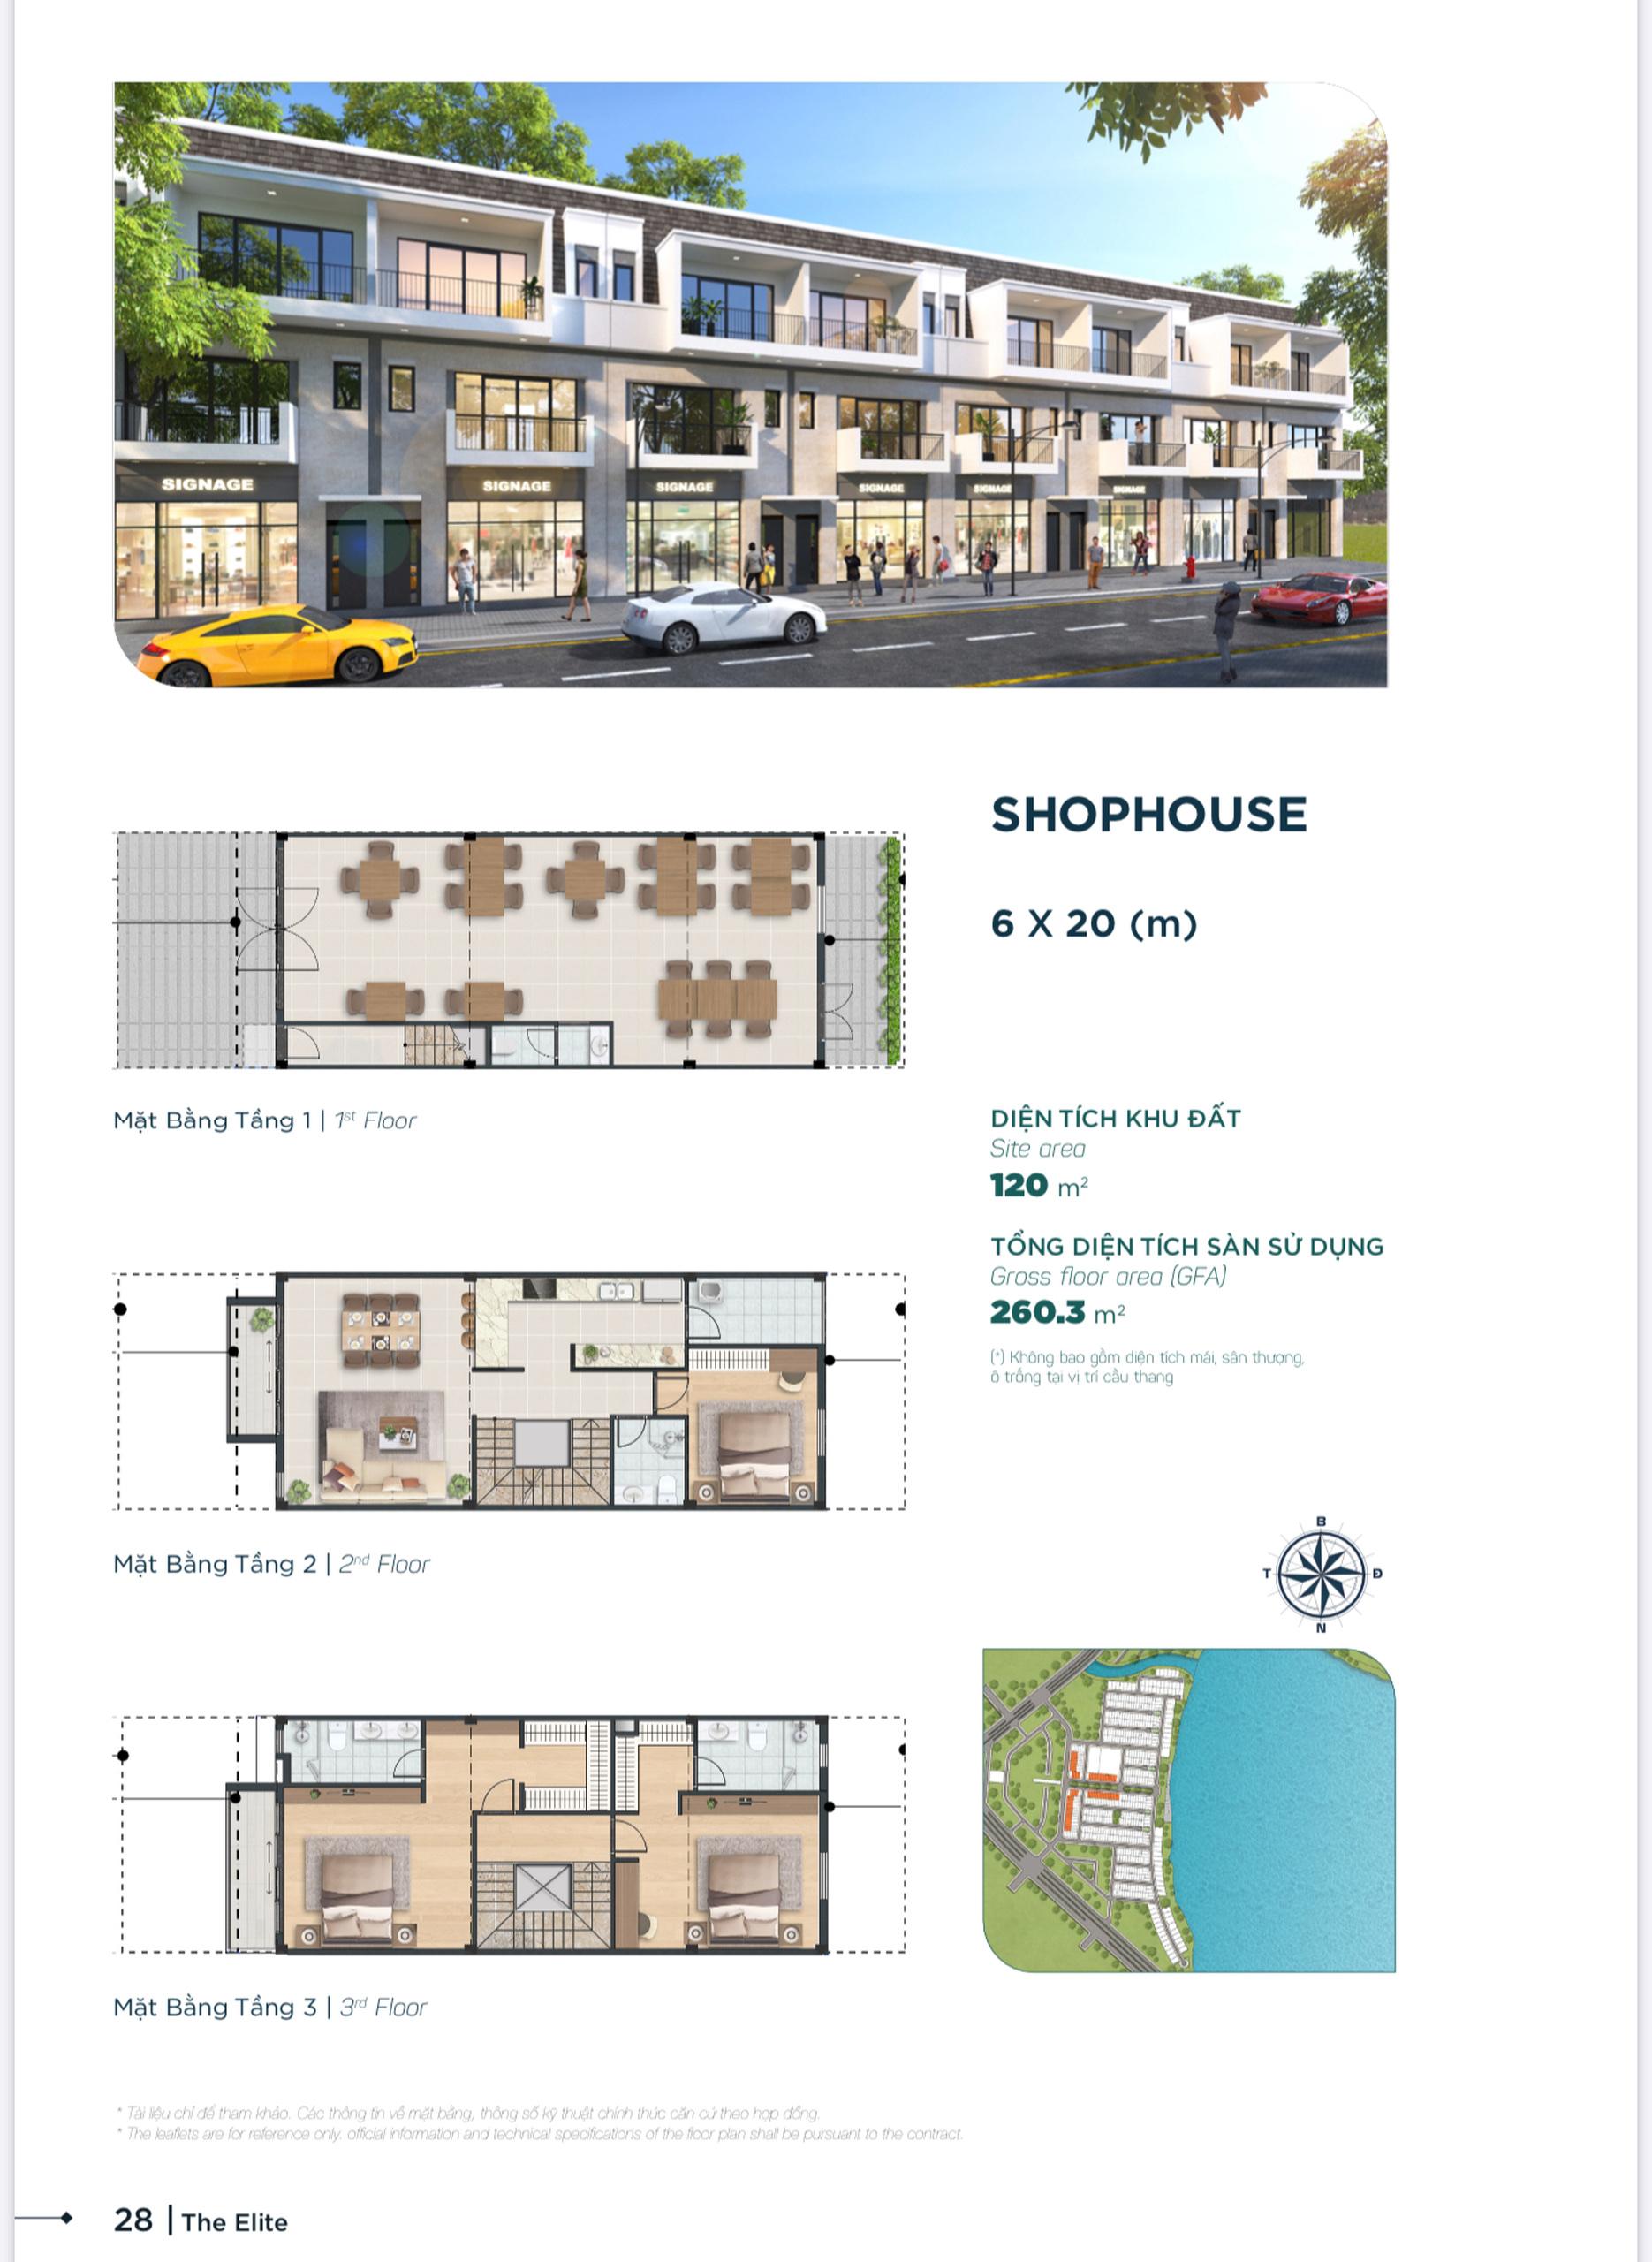 shophouse aqua city 6x20